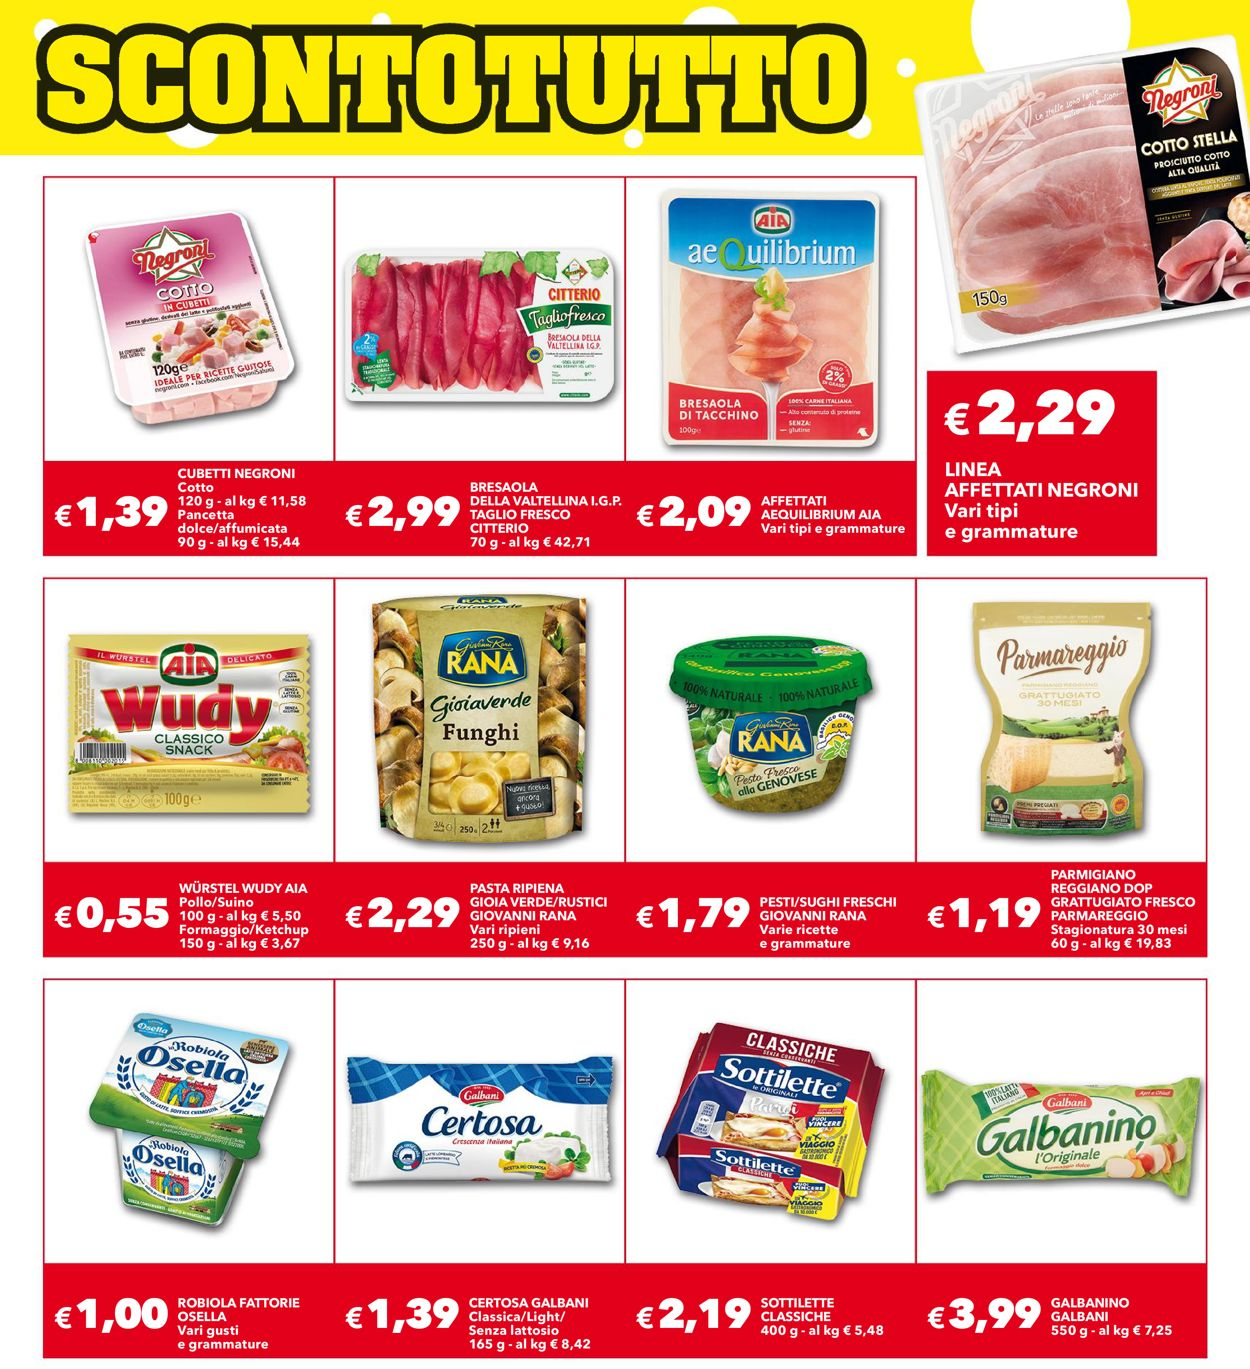 Volantino Auchan - Offerte 30/07-12/08/2020 (Pagina 5)